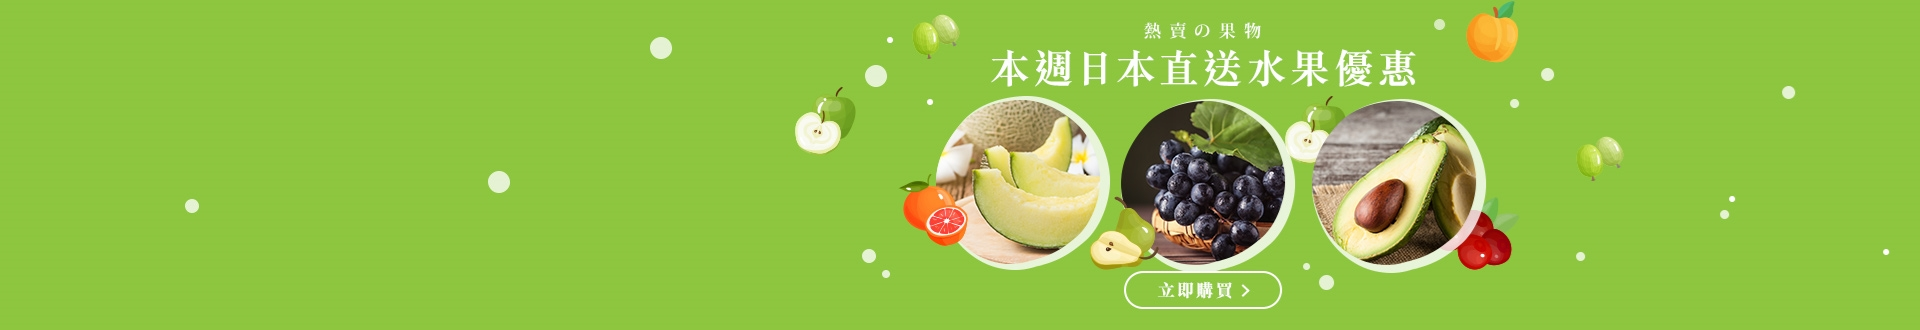 11Sep_FruitLaunch